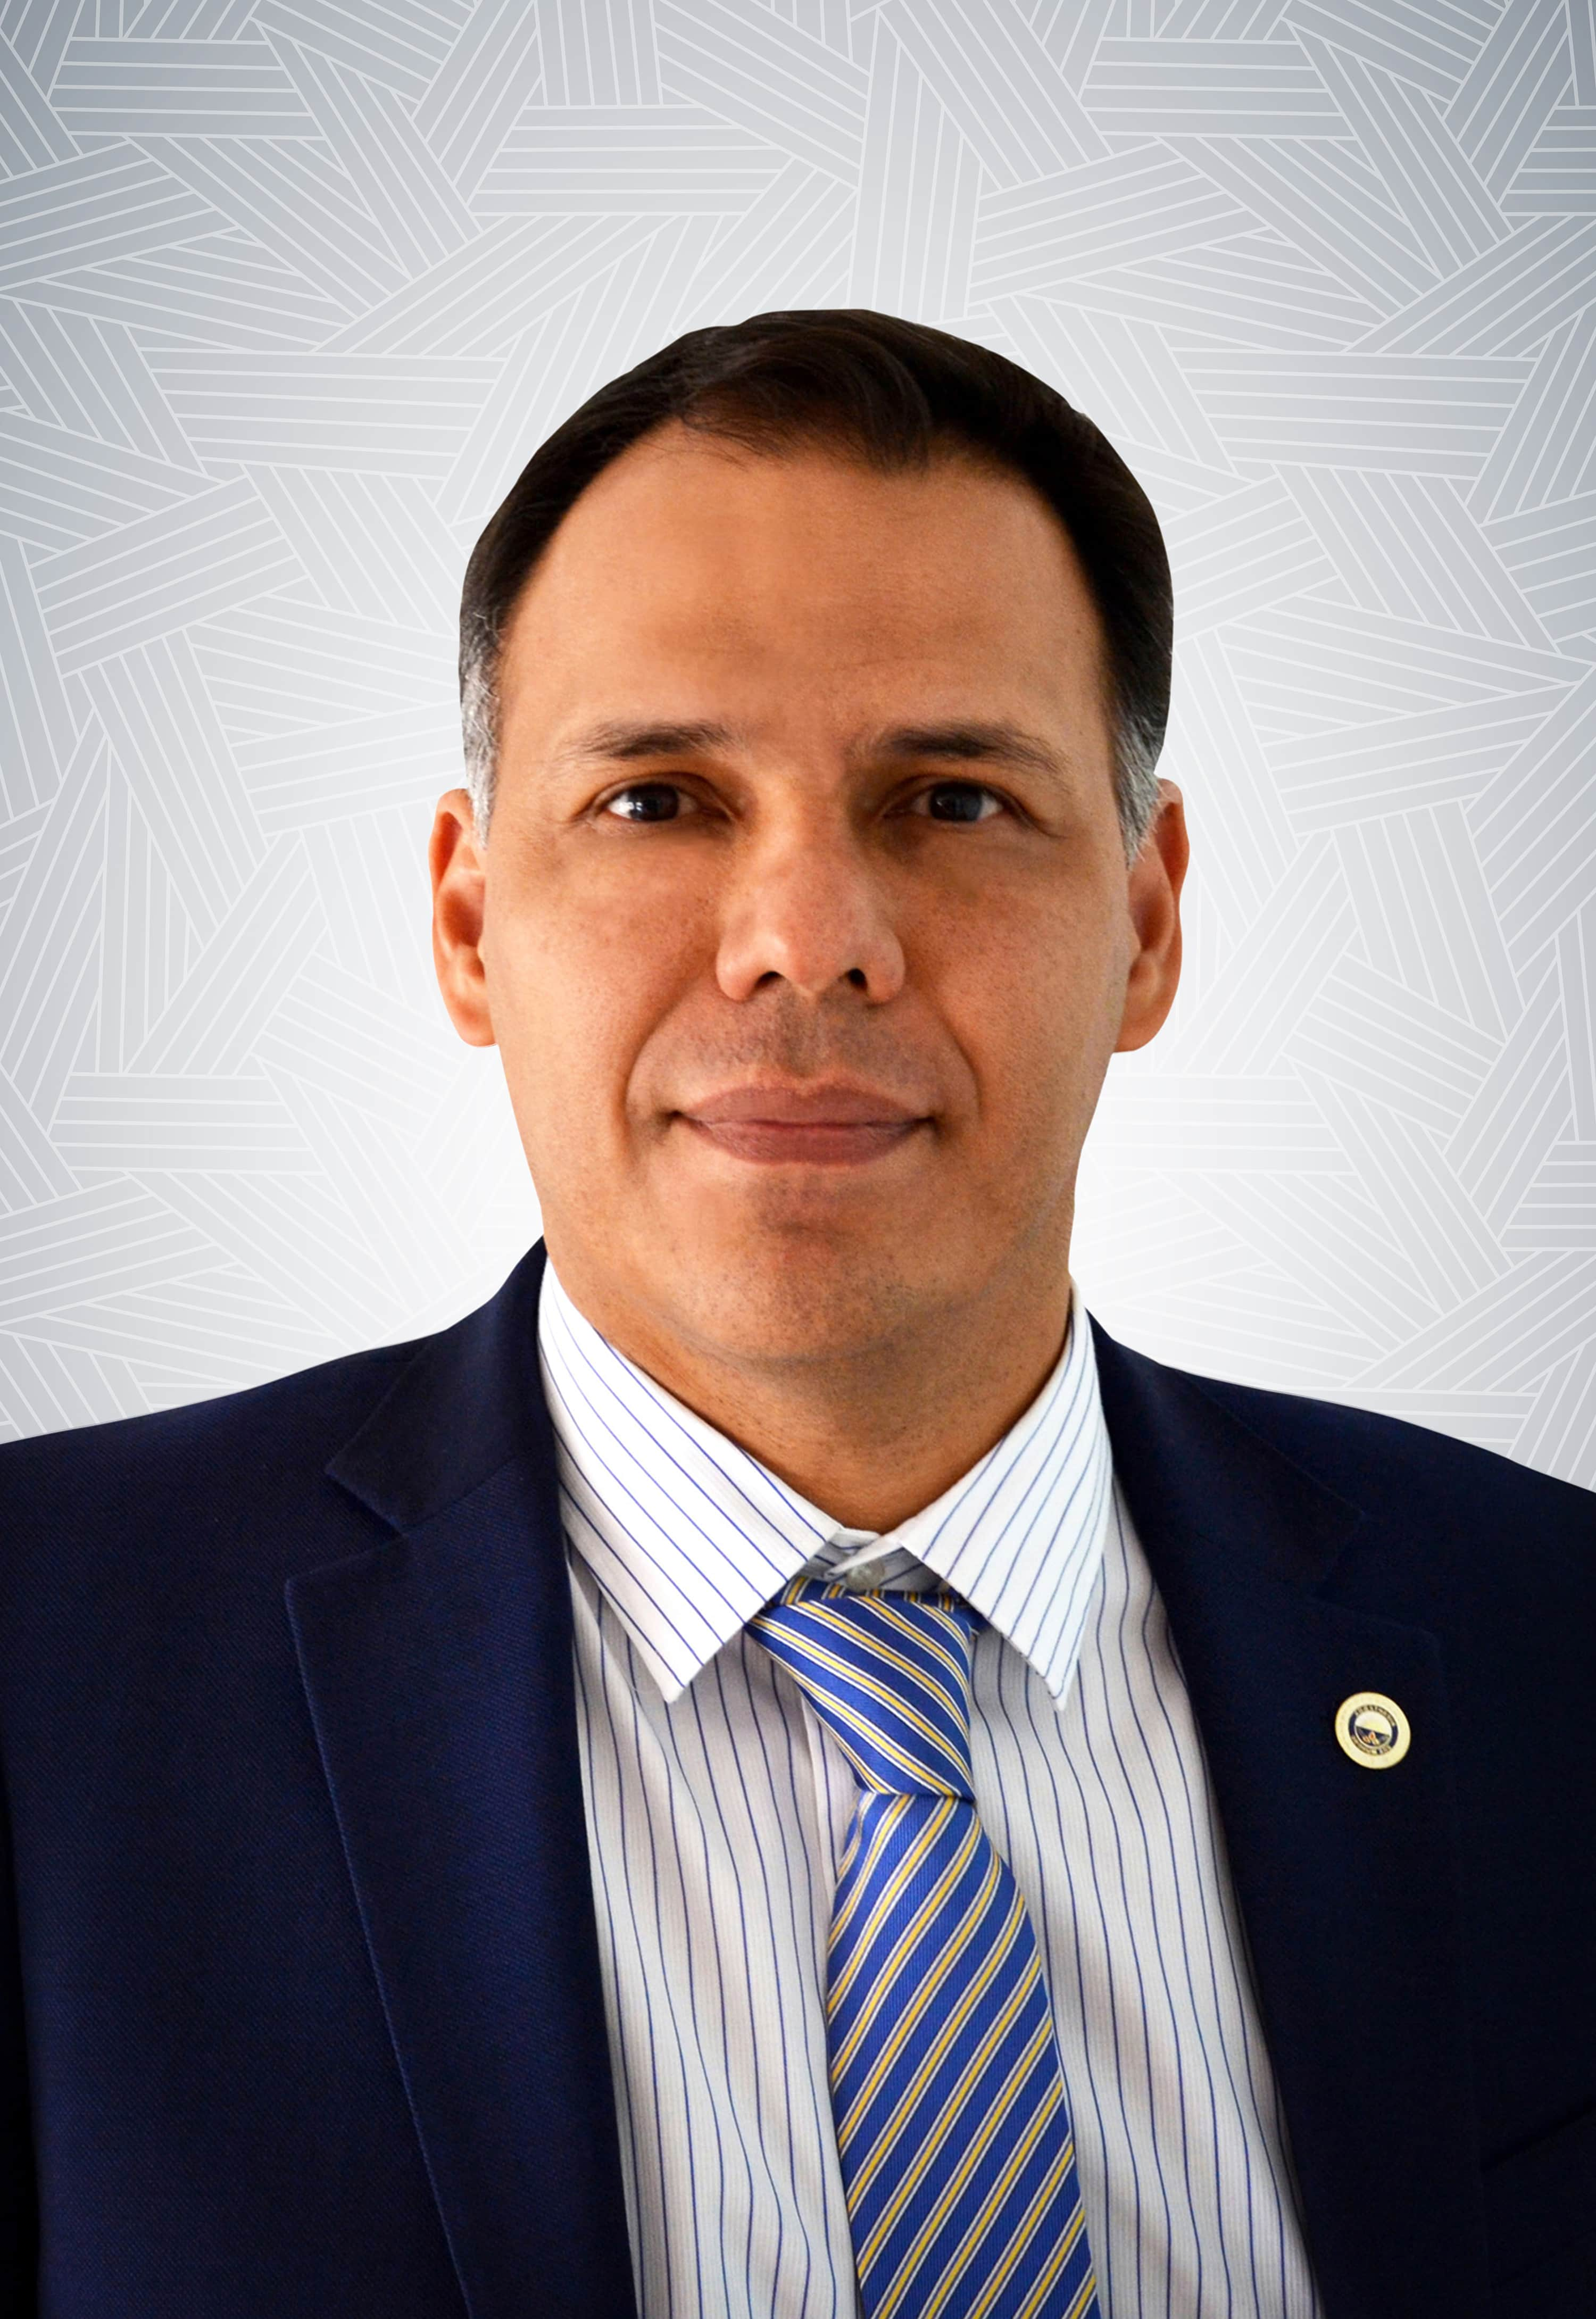 Dr. Mauricio Vasco